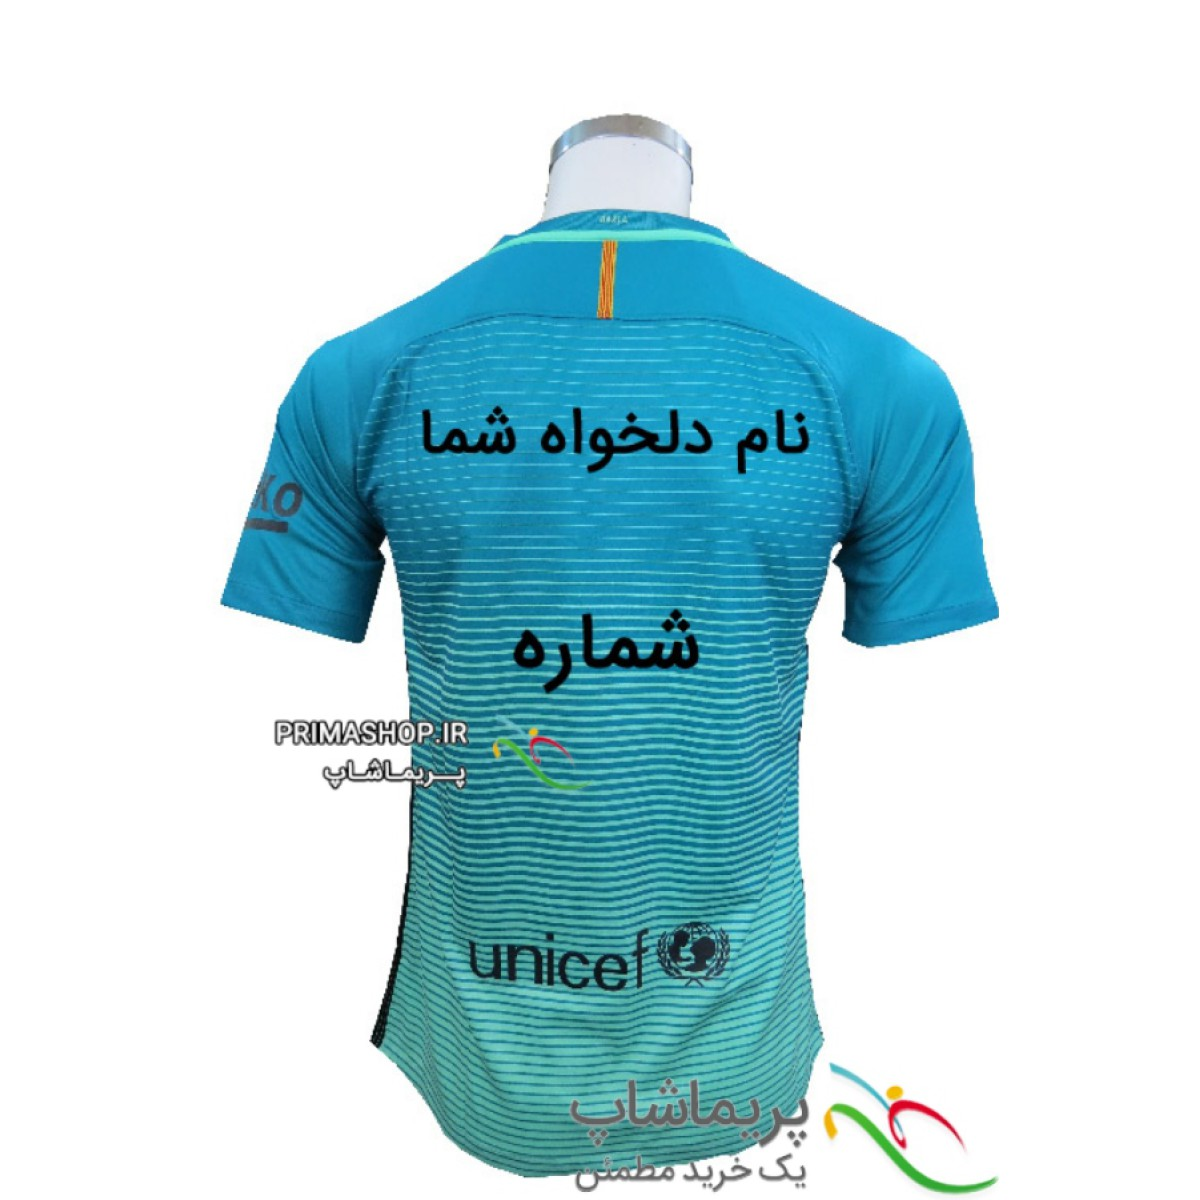 پیراهن سوم بارسلونا نام دلخواه (چاپ اختصاصی) 16/17 اورجینال درجه 1 تایلندی